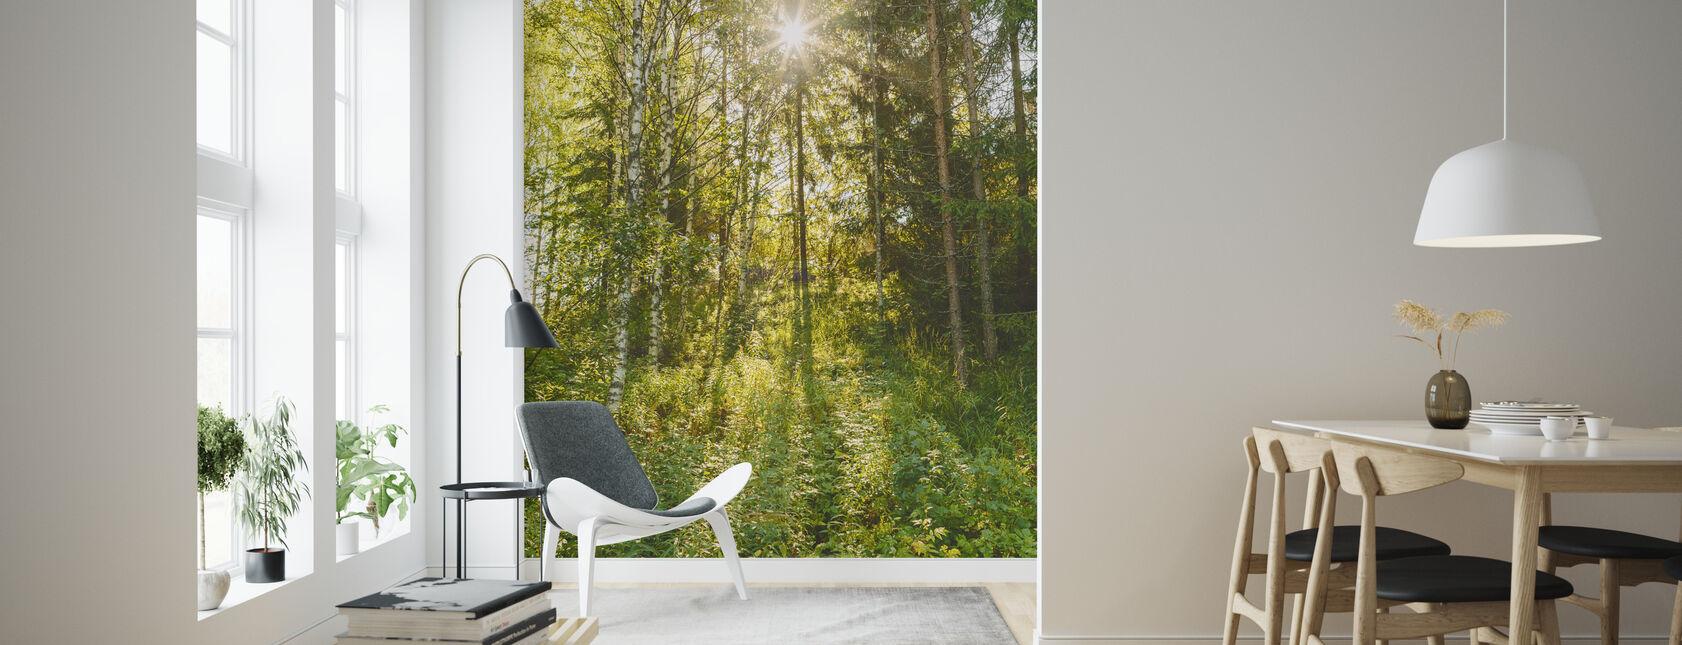 Zonovergoten bladverliezende bomen, Finland - Behang - Woonkamer